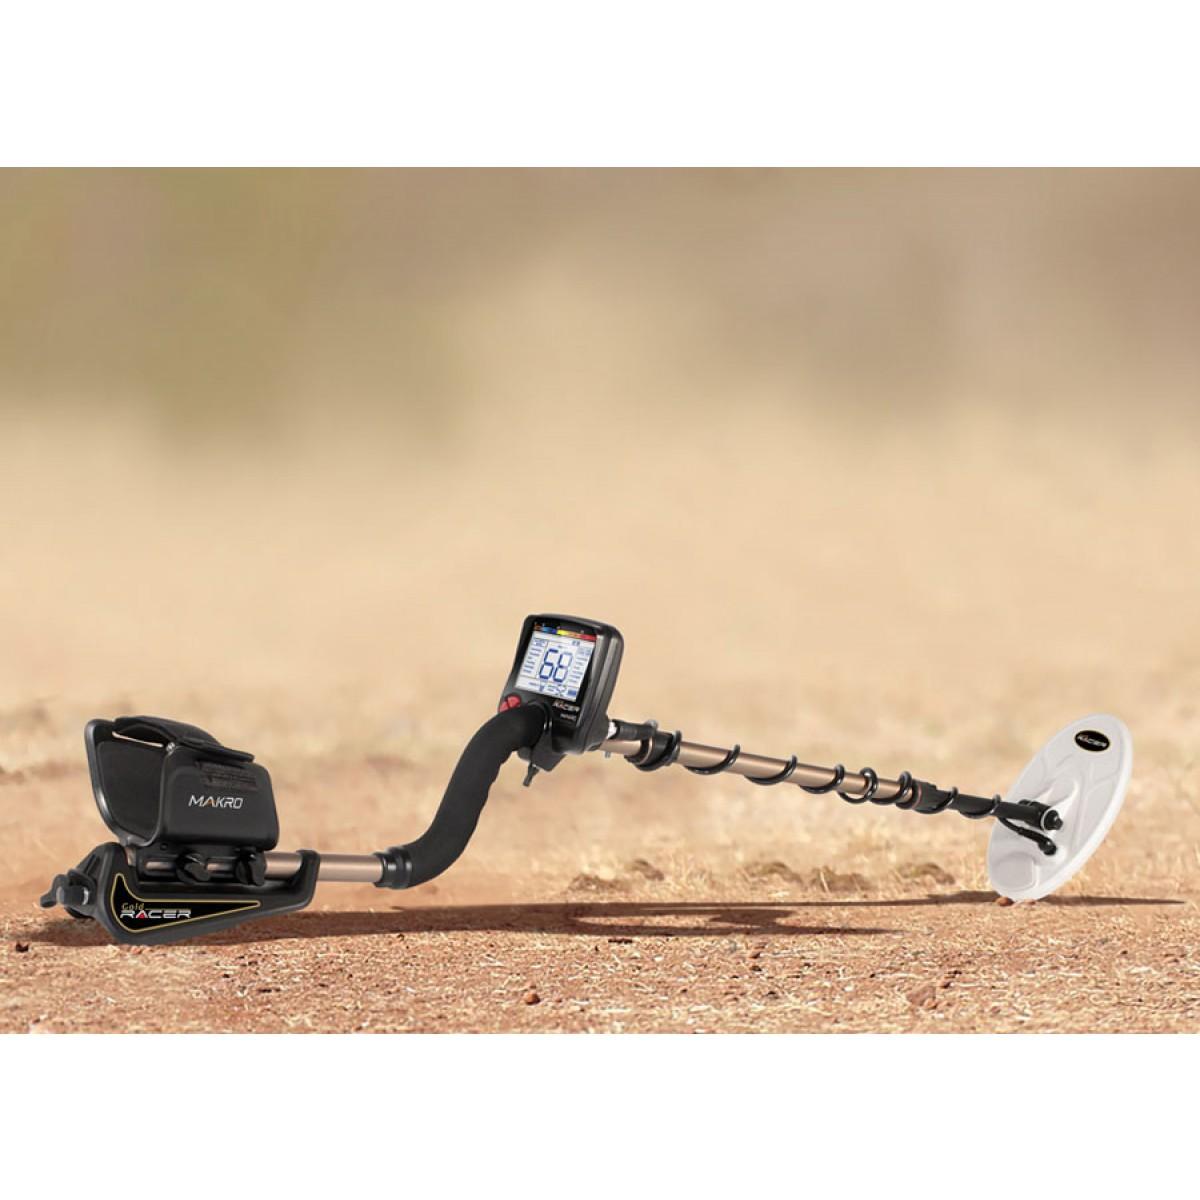 ndice - Foro Detector de Metales - Buscametales